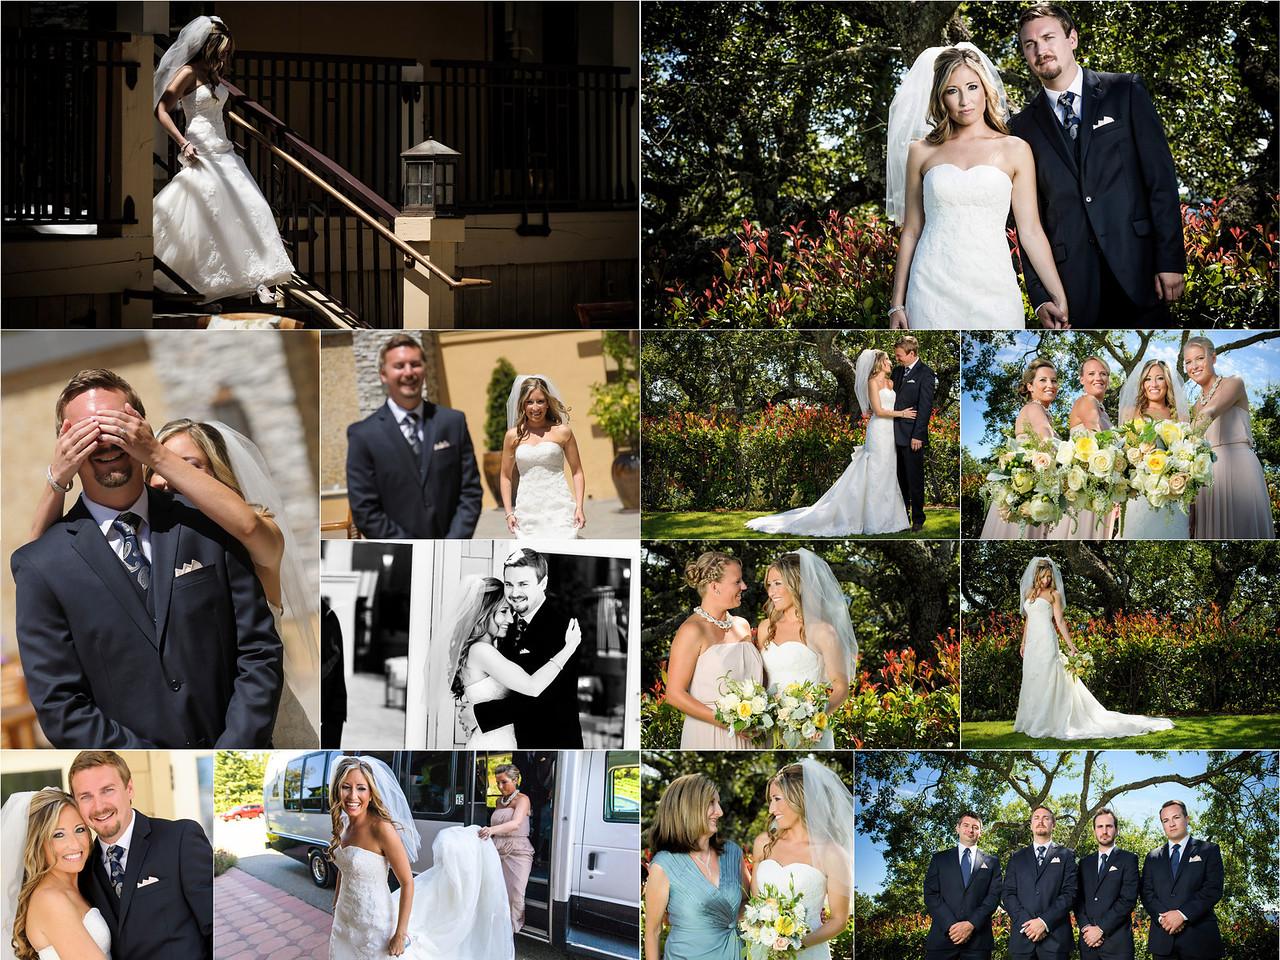 Erica_and_Justin_Byington_Winery_Los_Gatos_Wedding_Photography_4x6_Photo_Board_03